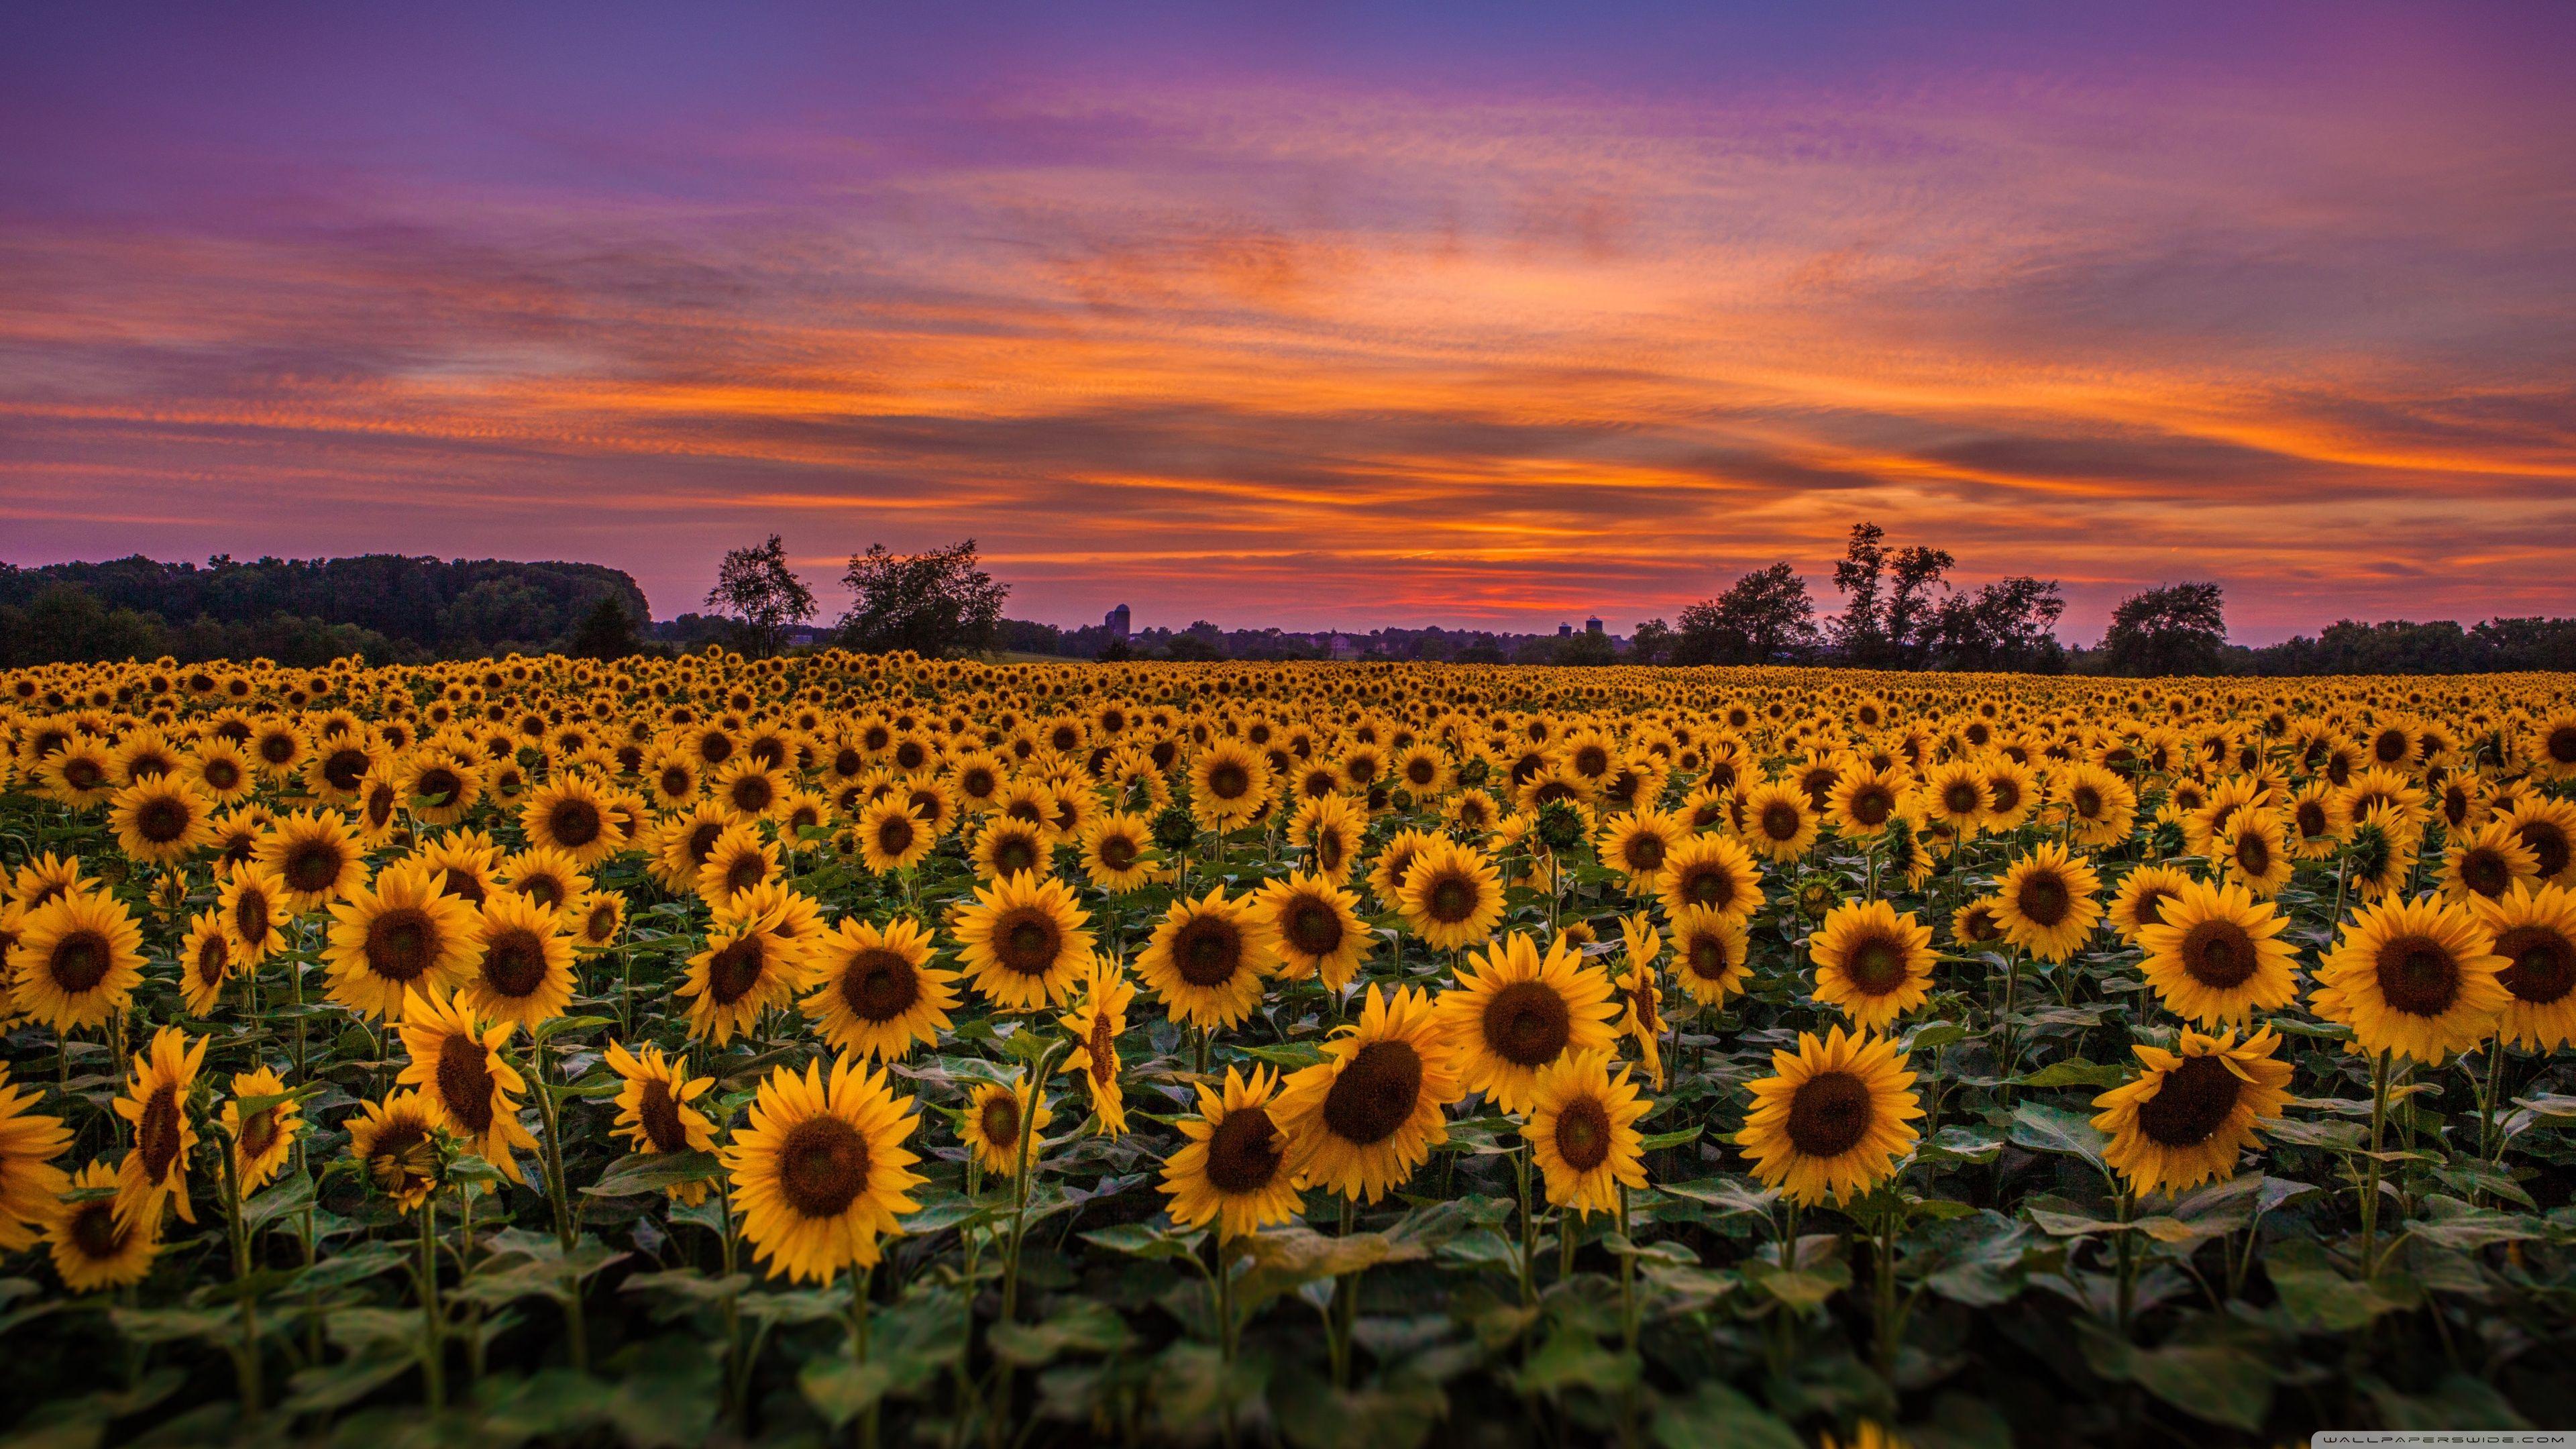 Sunflower Wallpapers Top Free Sunflower Backgrounds Wallpaperaccess